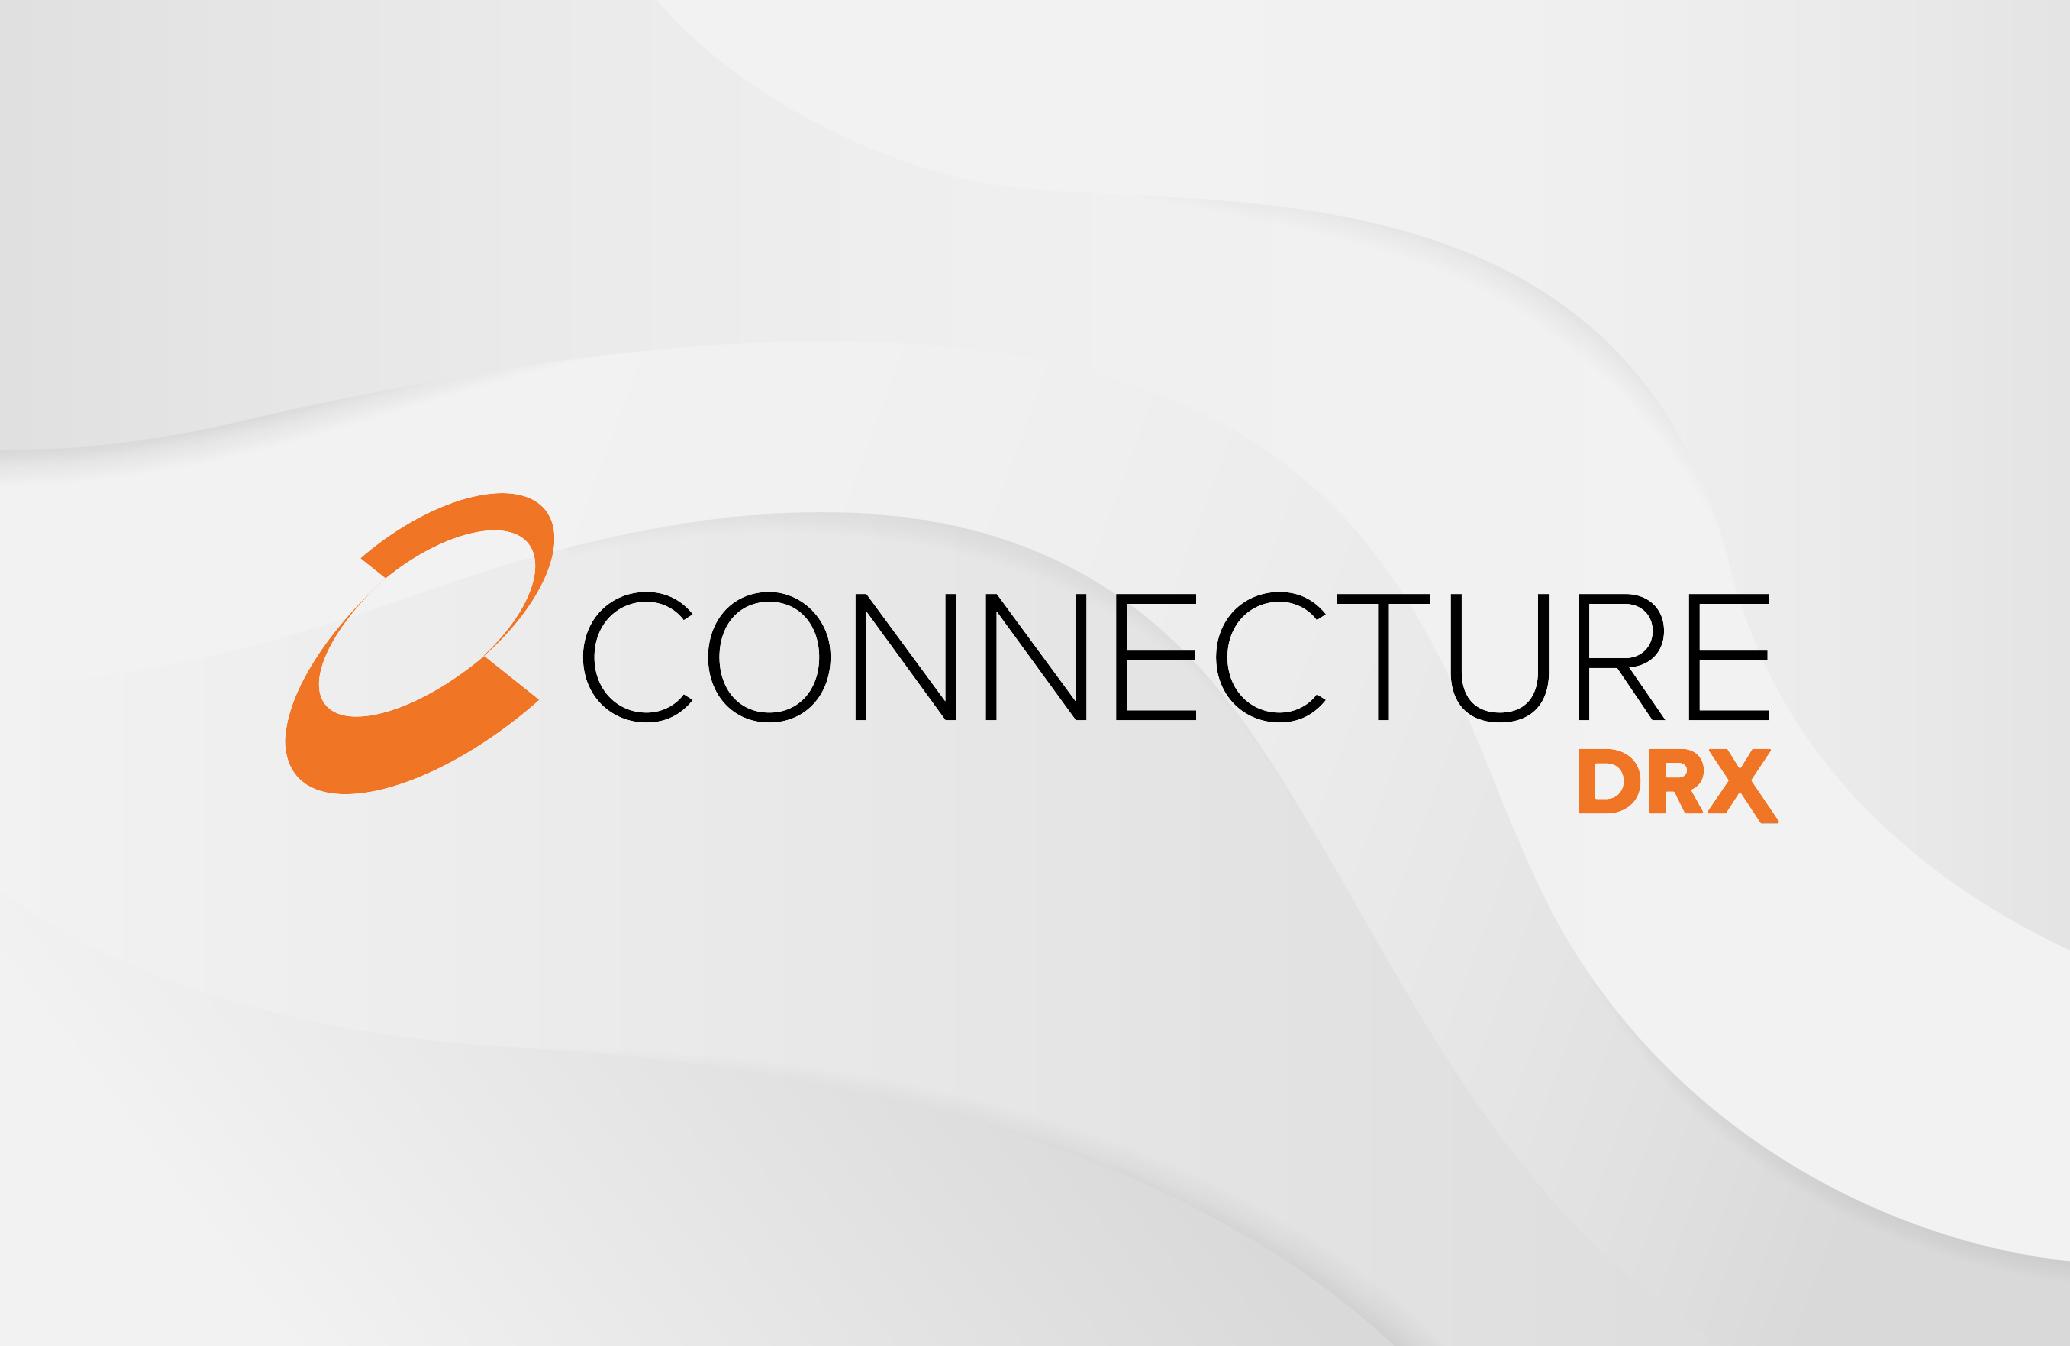 ConnectureDRX